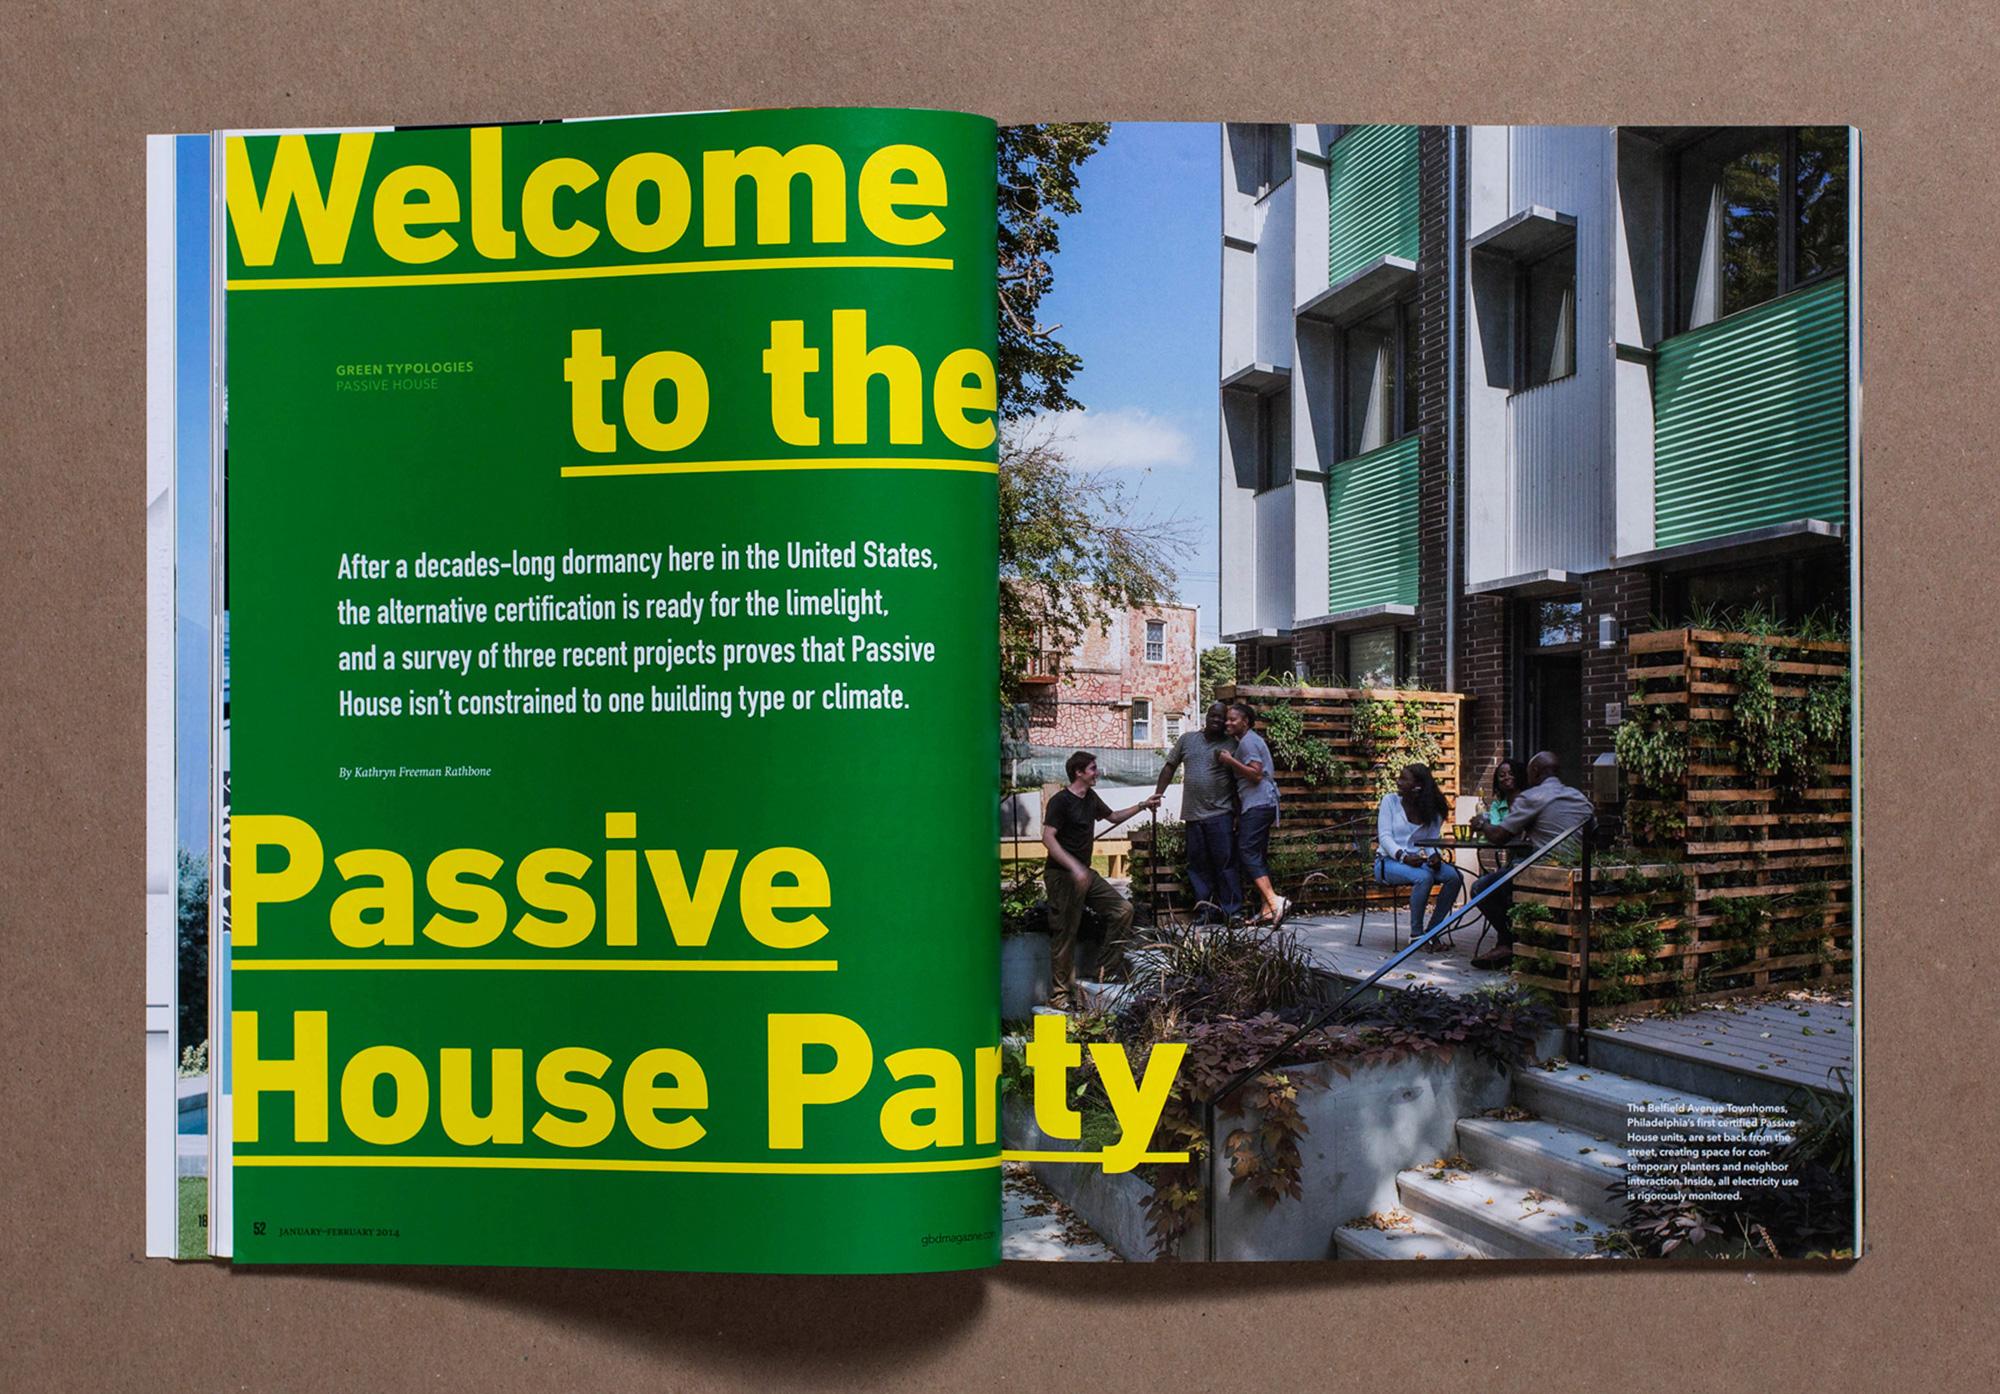 aaronglewis_GBD_Typ-Passive-House.jpg